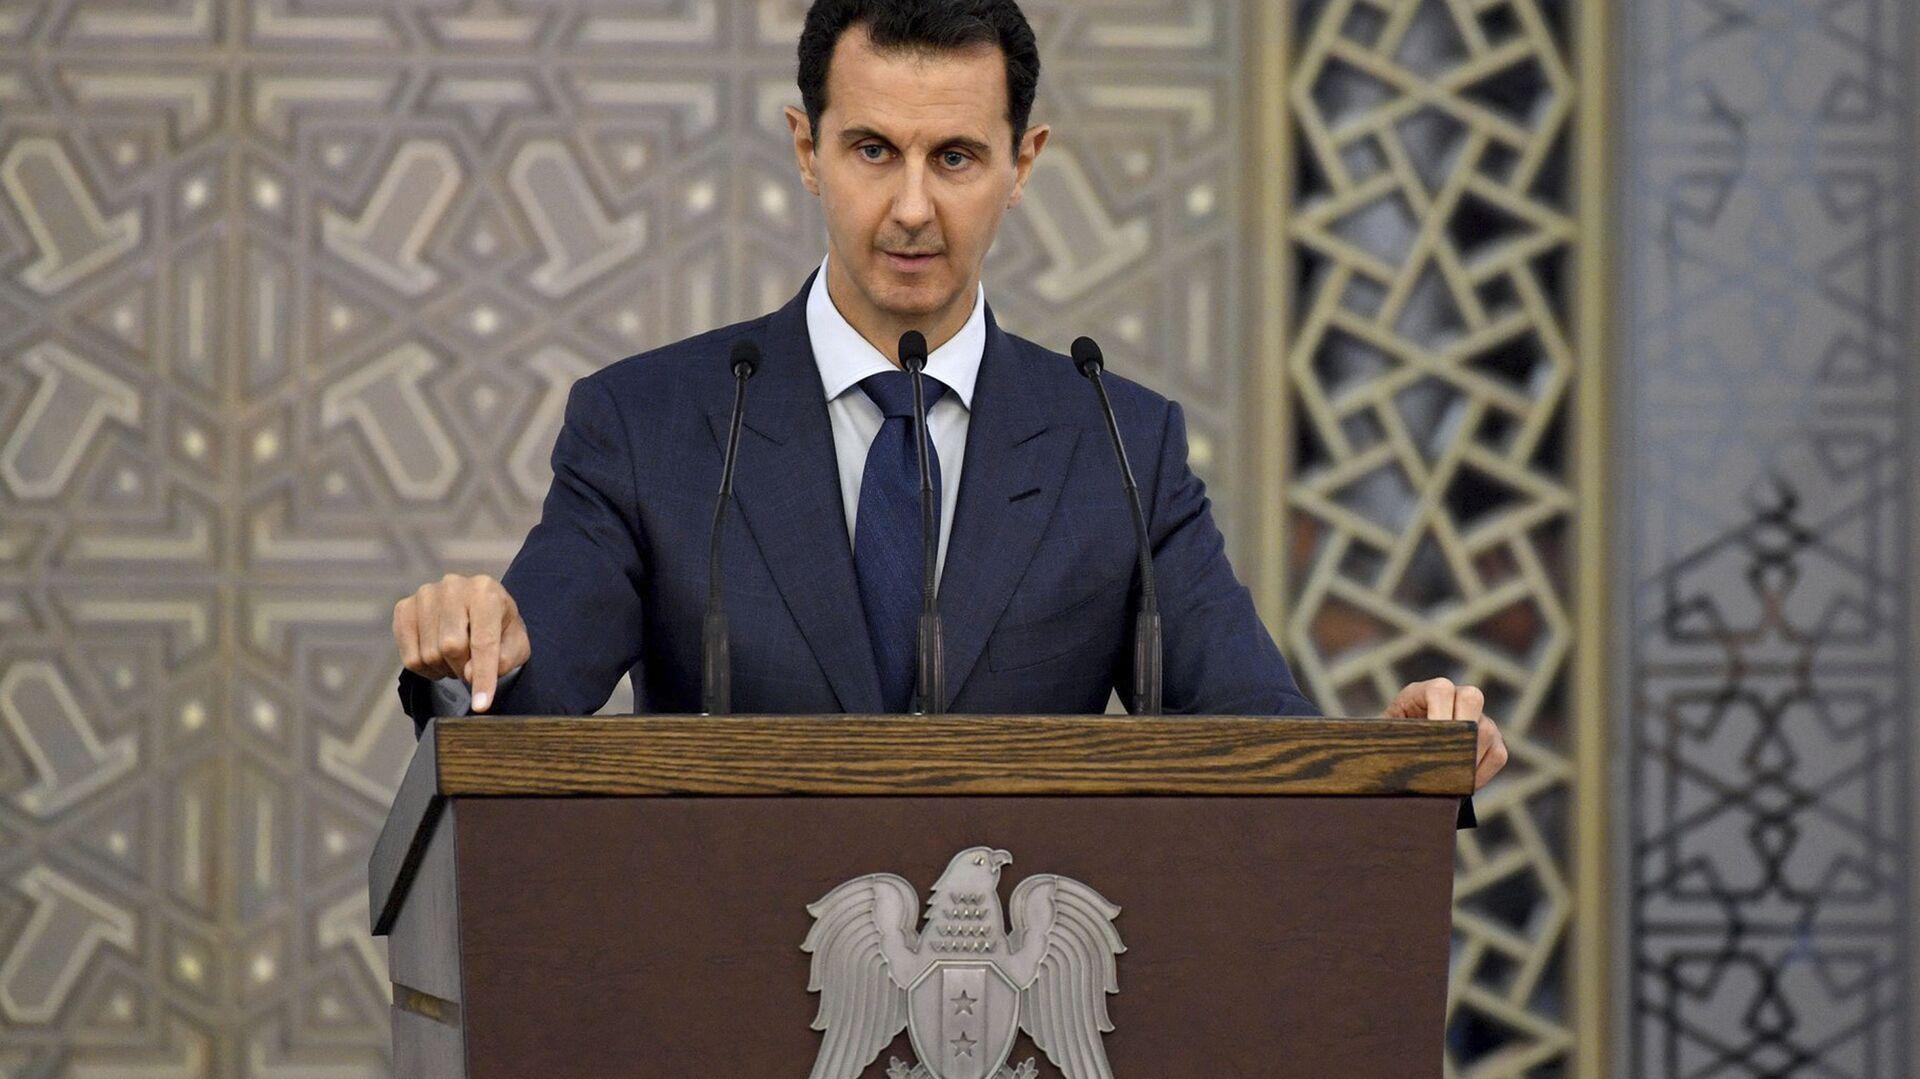 Il Presidente siriano Bashar Assad - Sputnik Italia, 1920, 27.05.2021